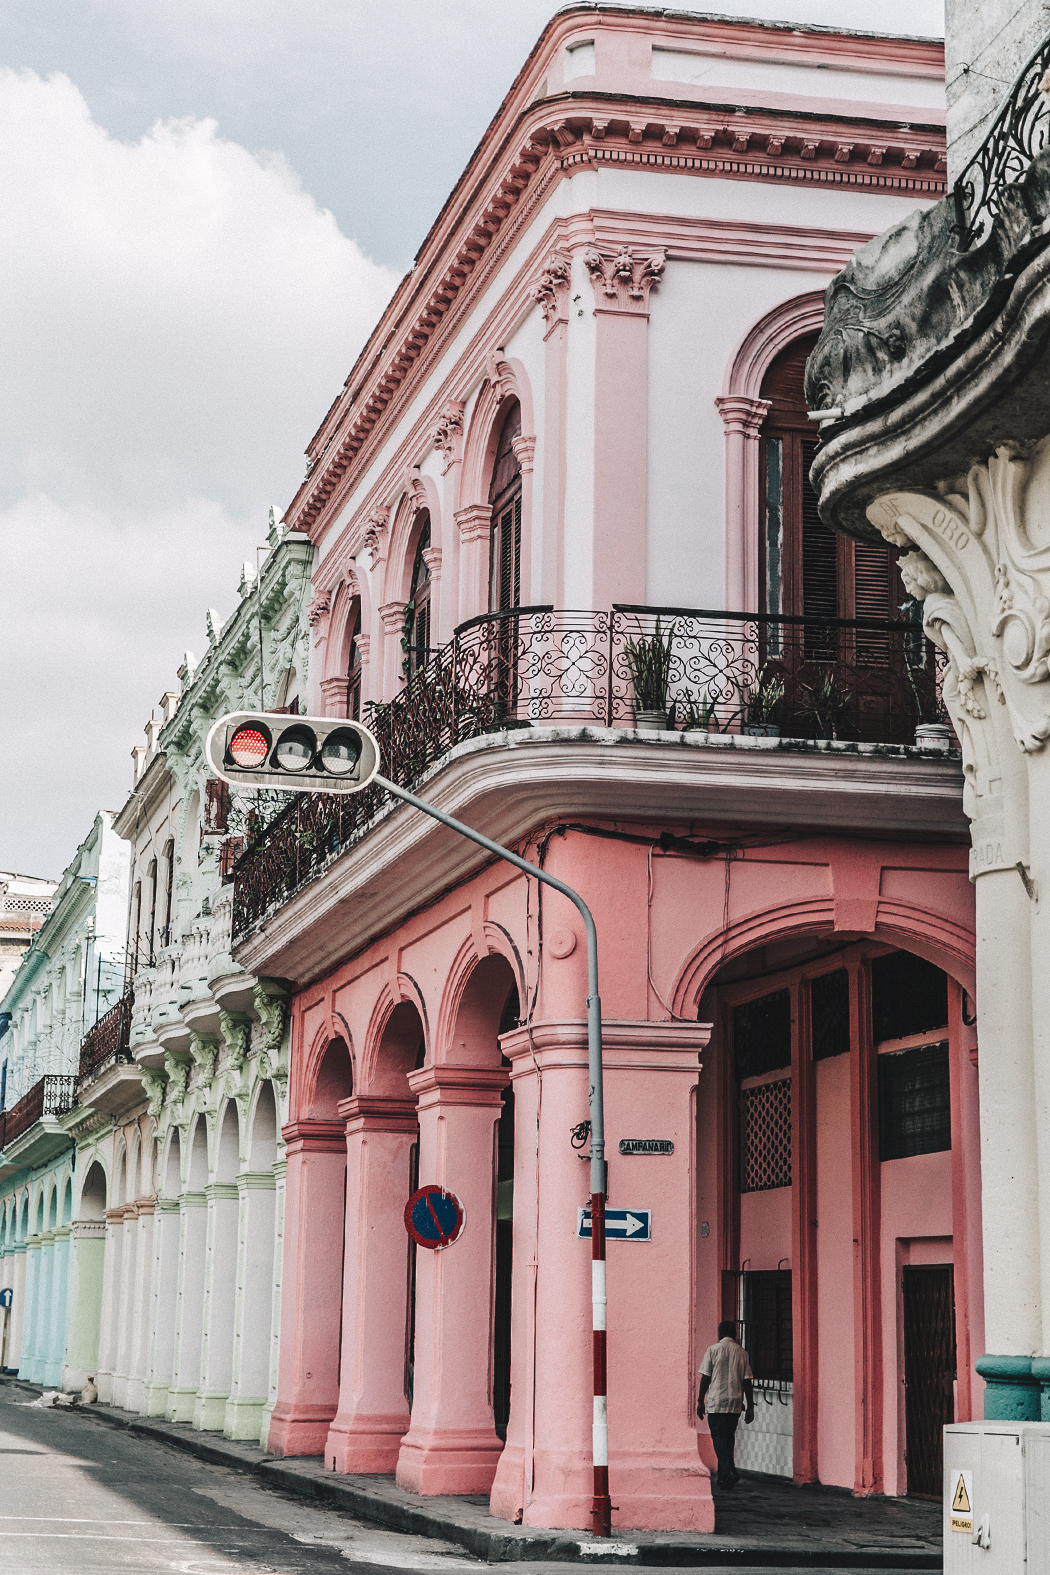 La_Habana-Cuba-Collage_On_The_Road-Fresa_Y_Chocolate-La_Guarida-Mint_Dress-Revolve_Clothing-Espadrilles-Outfit-Collage_Vintage-12